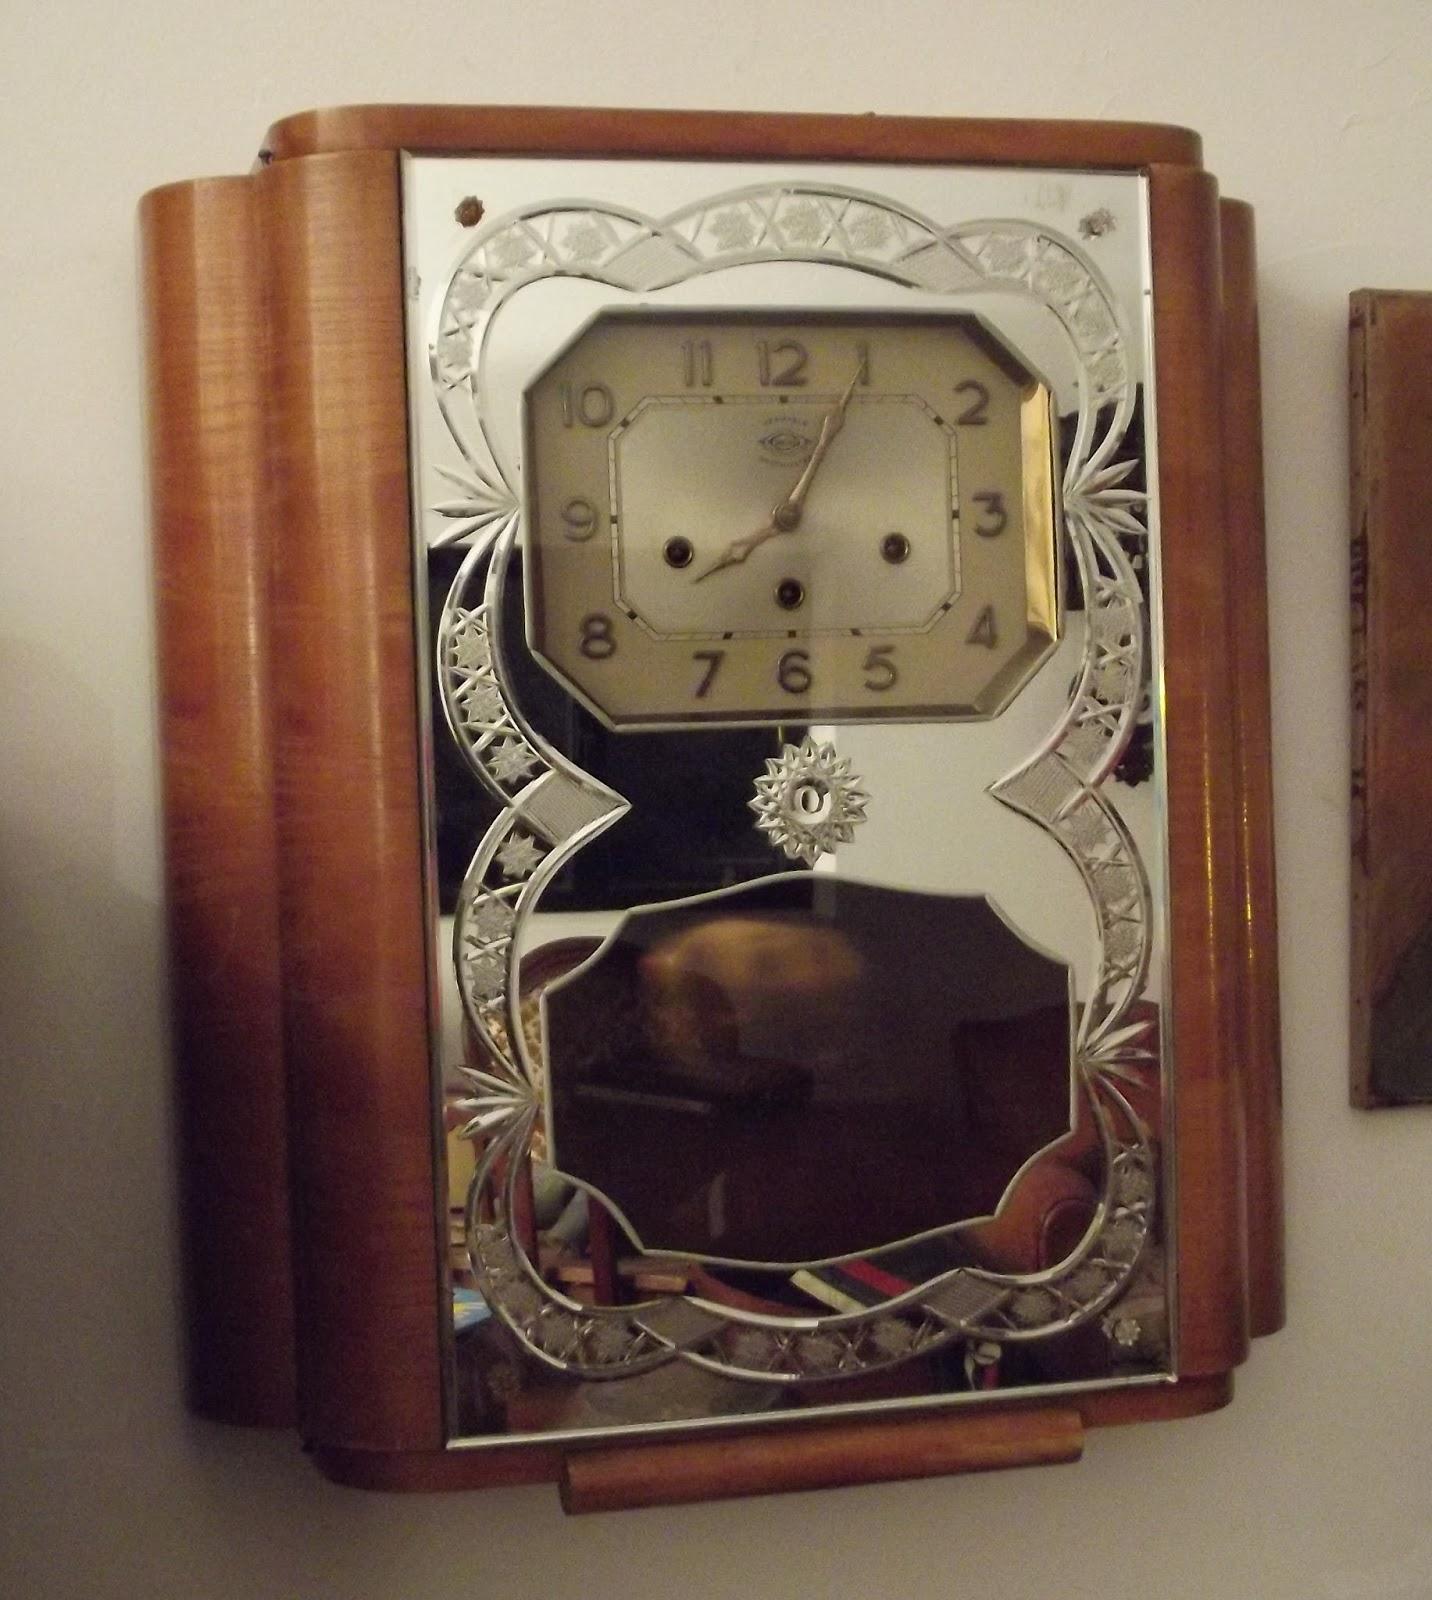 ancien carillon veritable westminster irod 2 melodies ave maria miroir. Black Bedroom Furniture Sets. Home Design Ideas